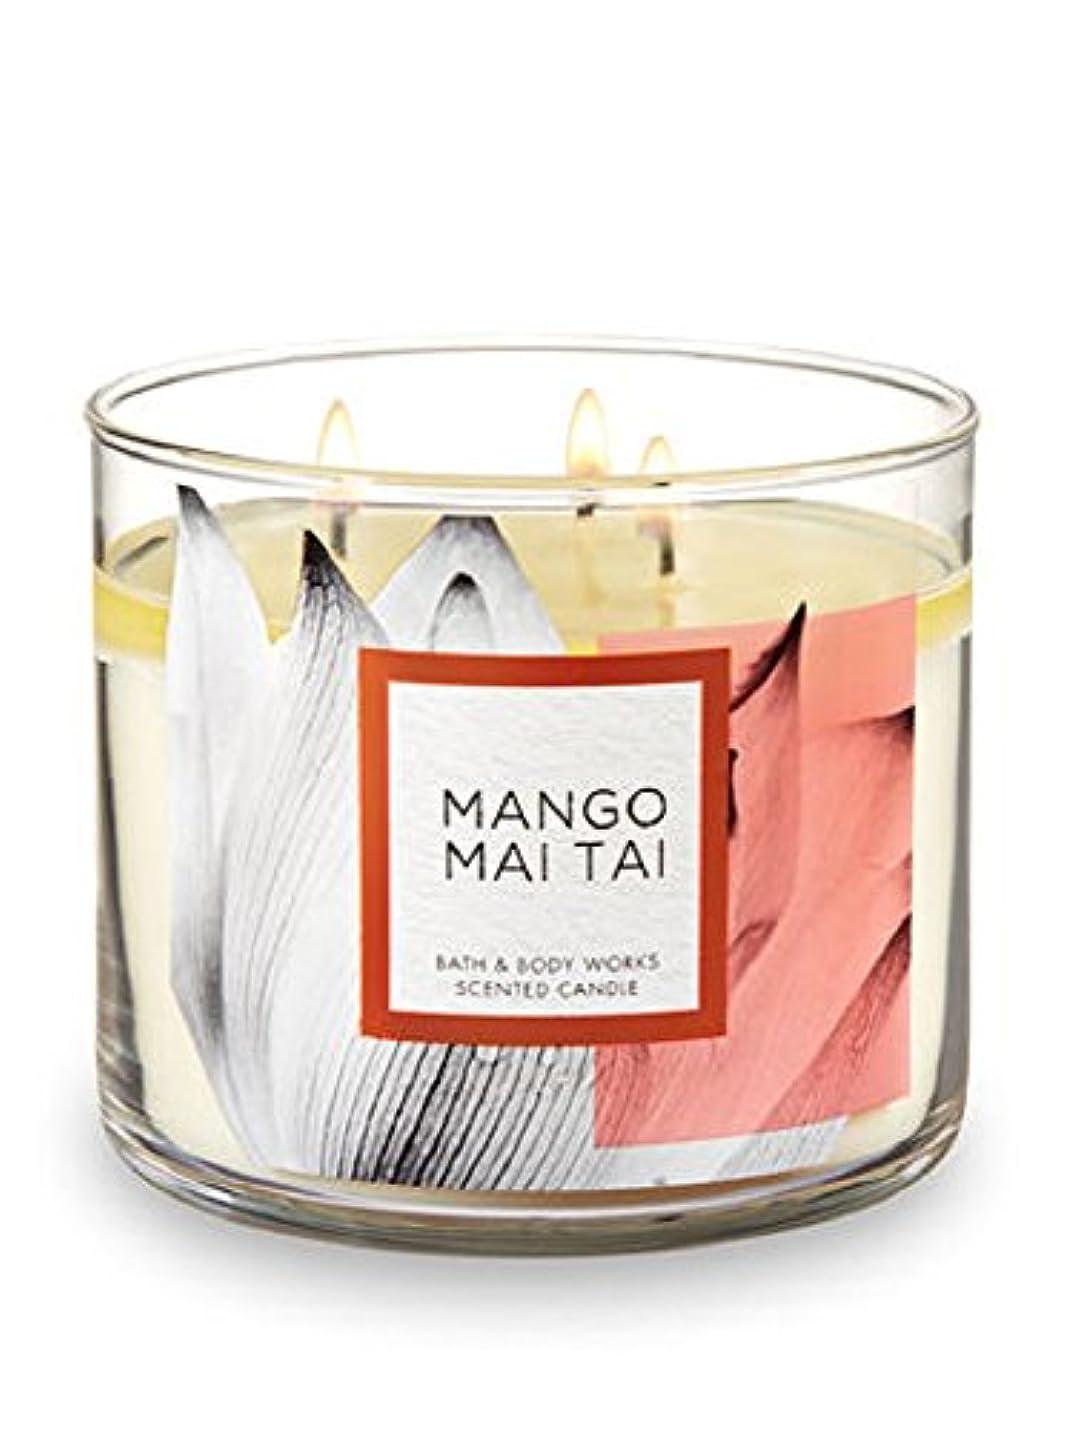 Bath and Body Work Mango Mai Tai 3 Wick Candle新しいfor 2018